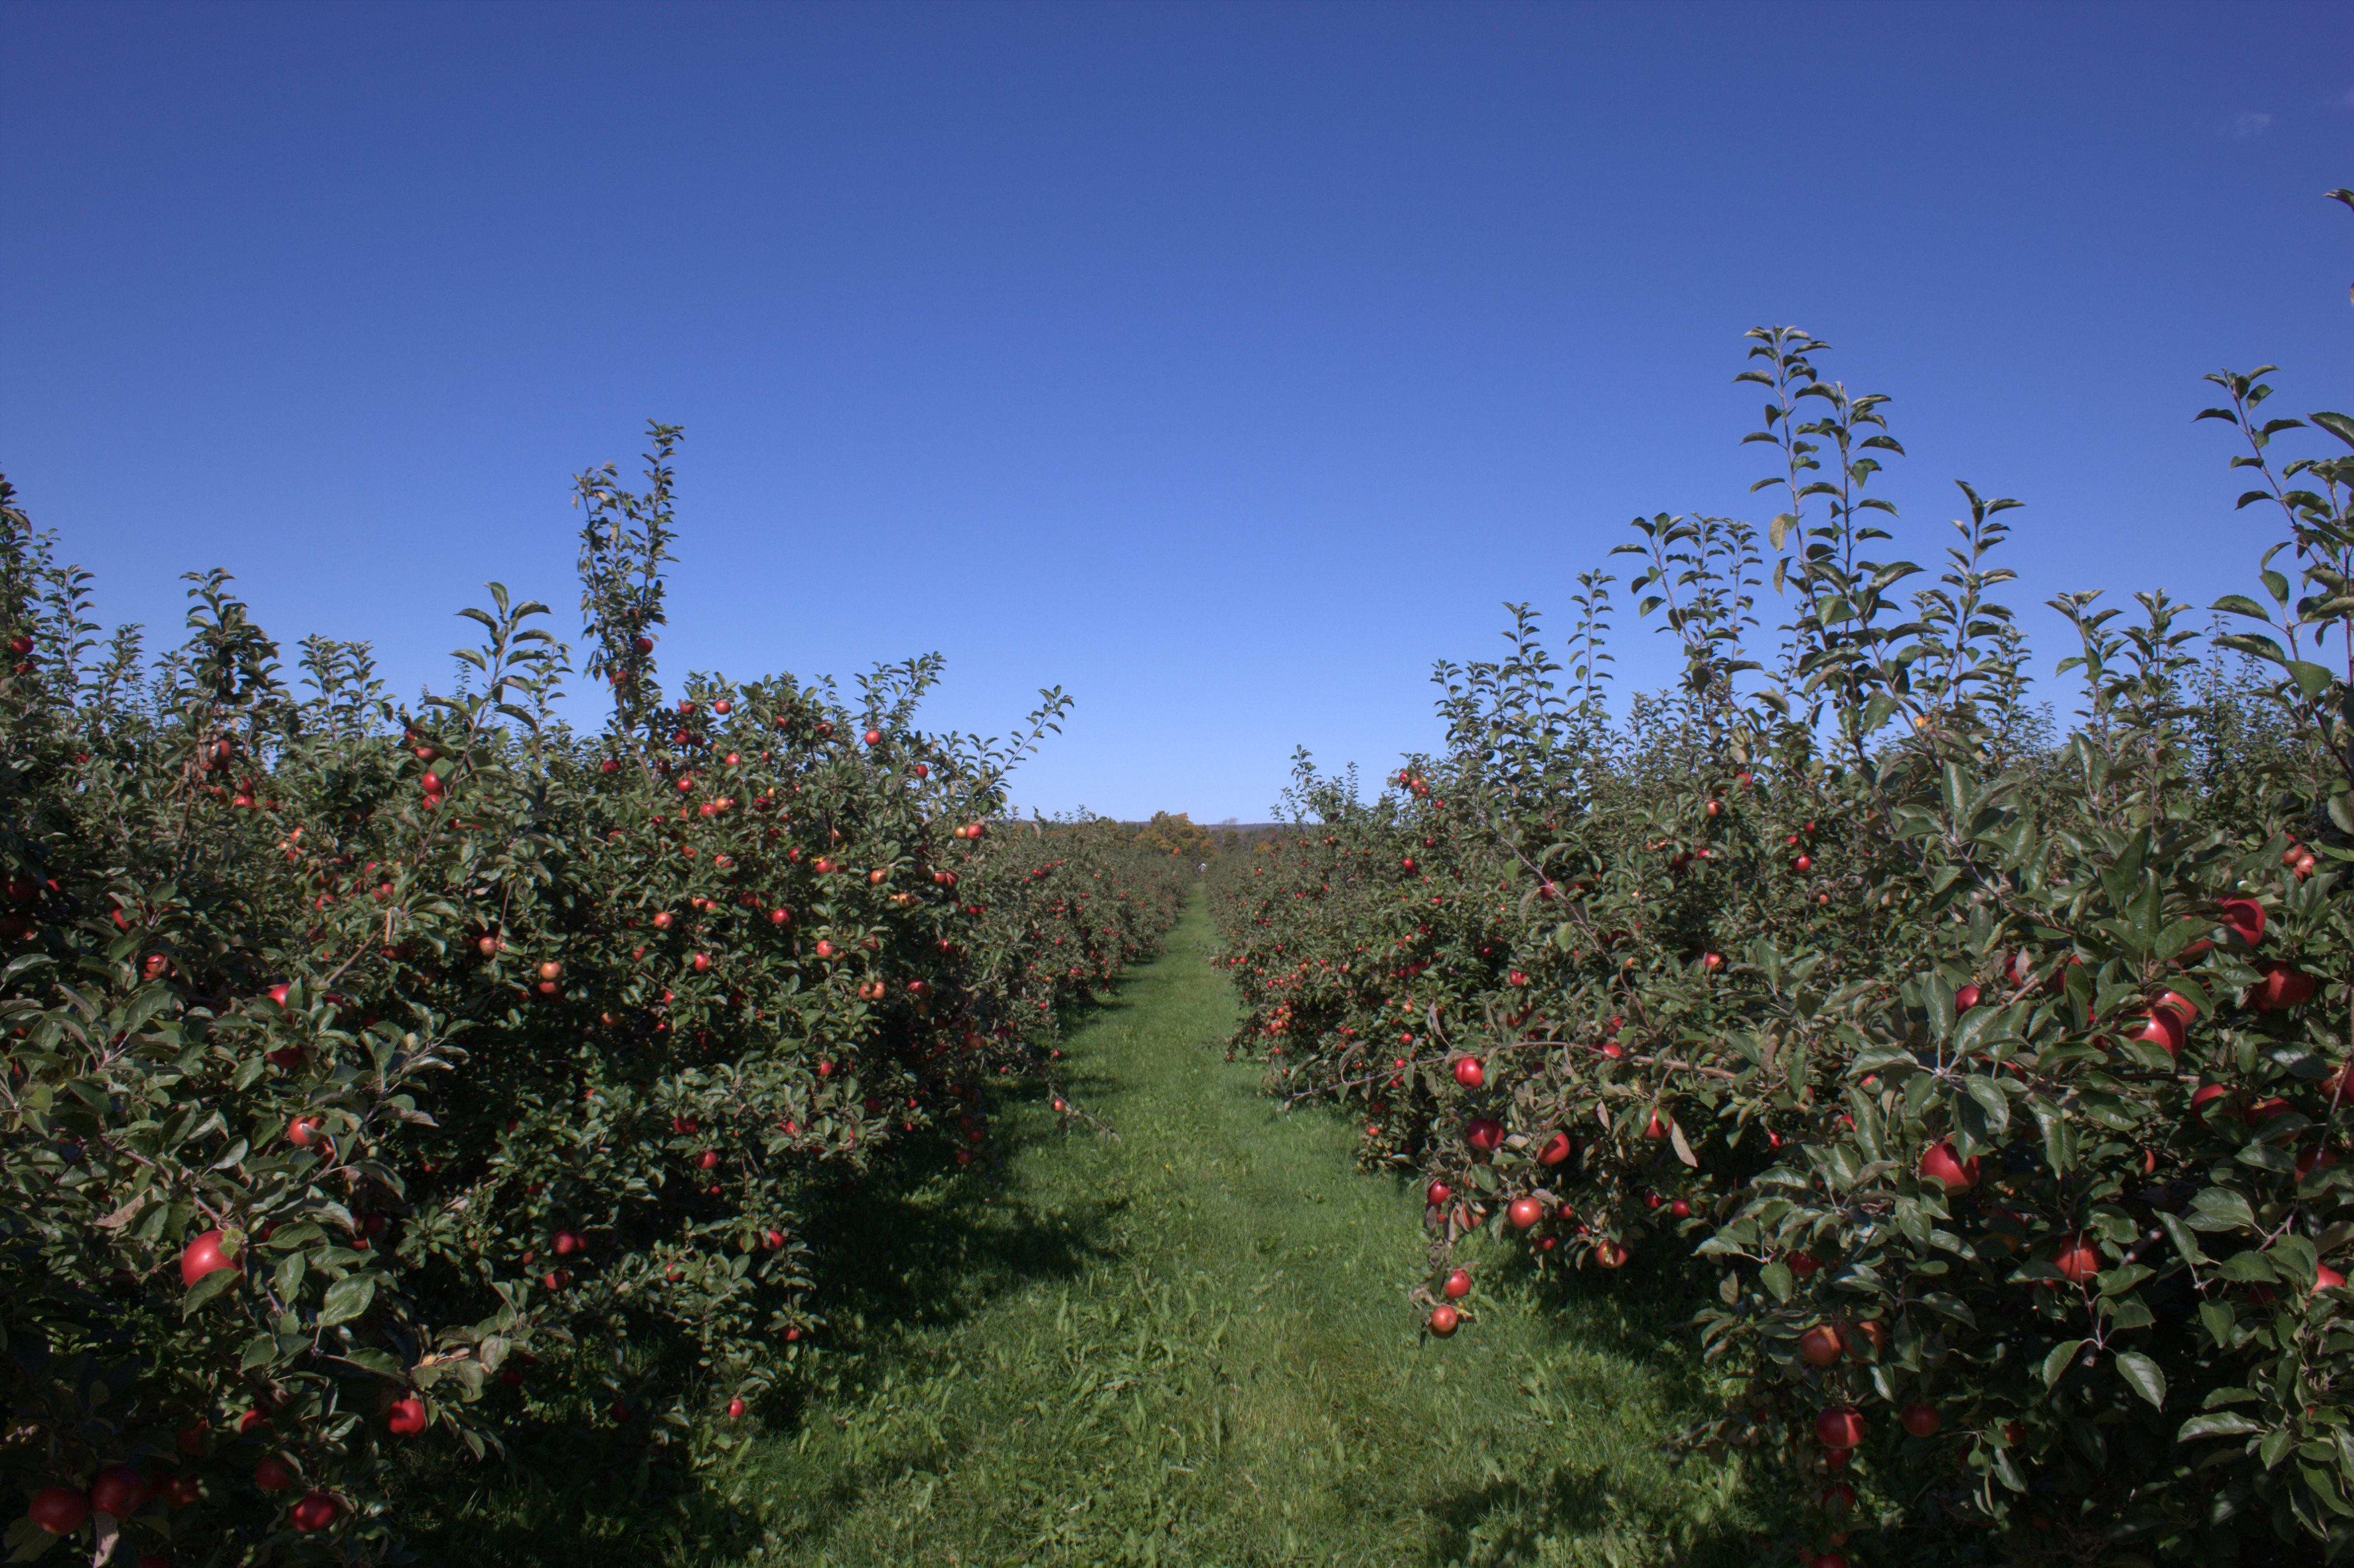 File:Honeycrisp apple orchard.jpg